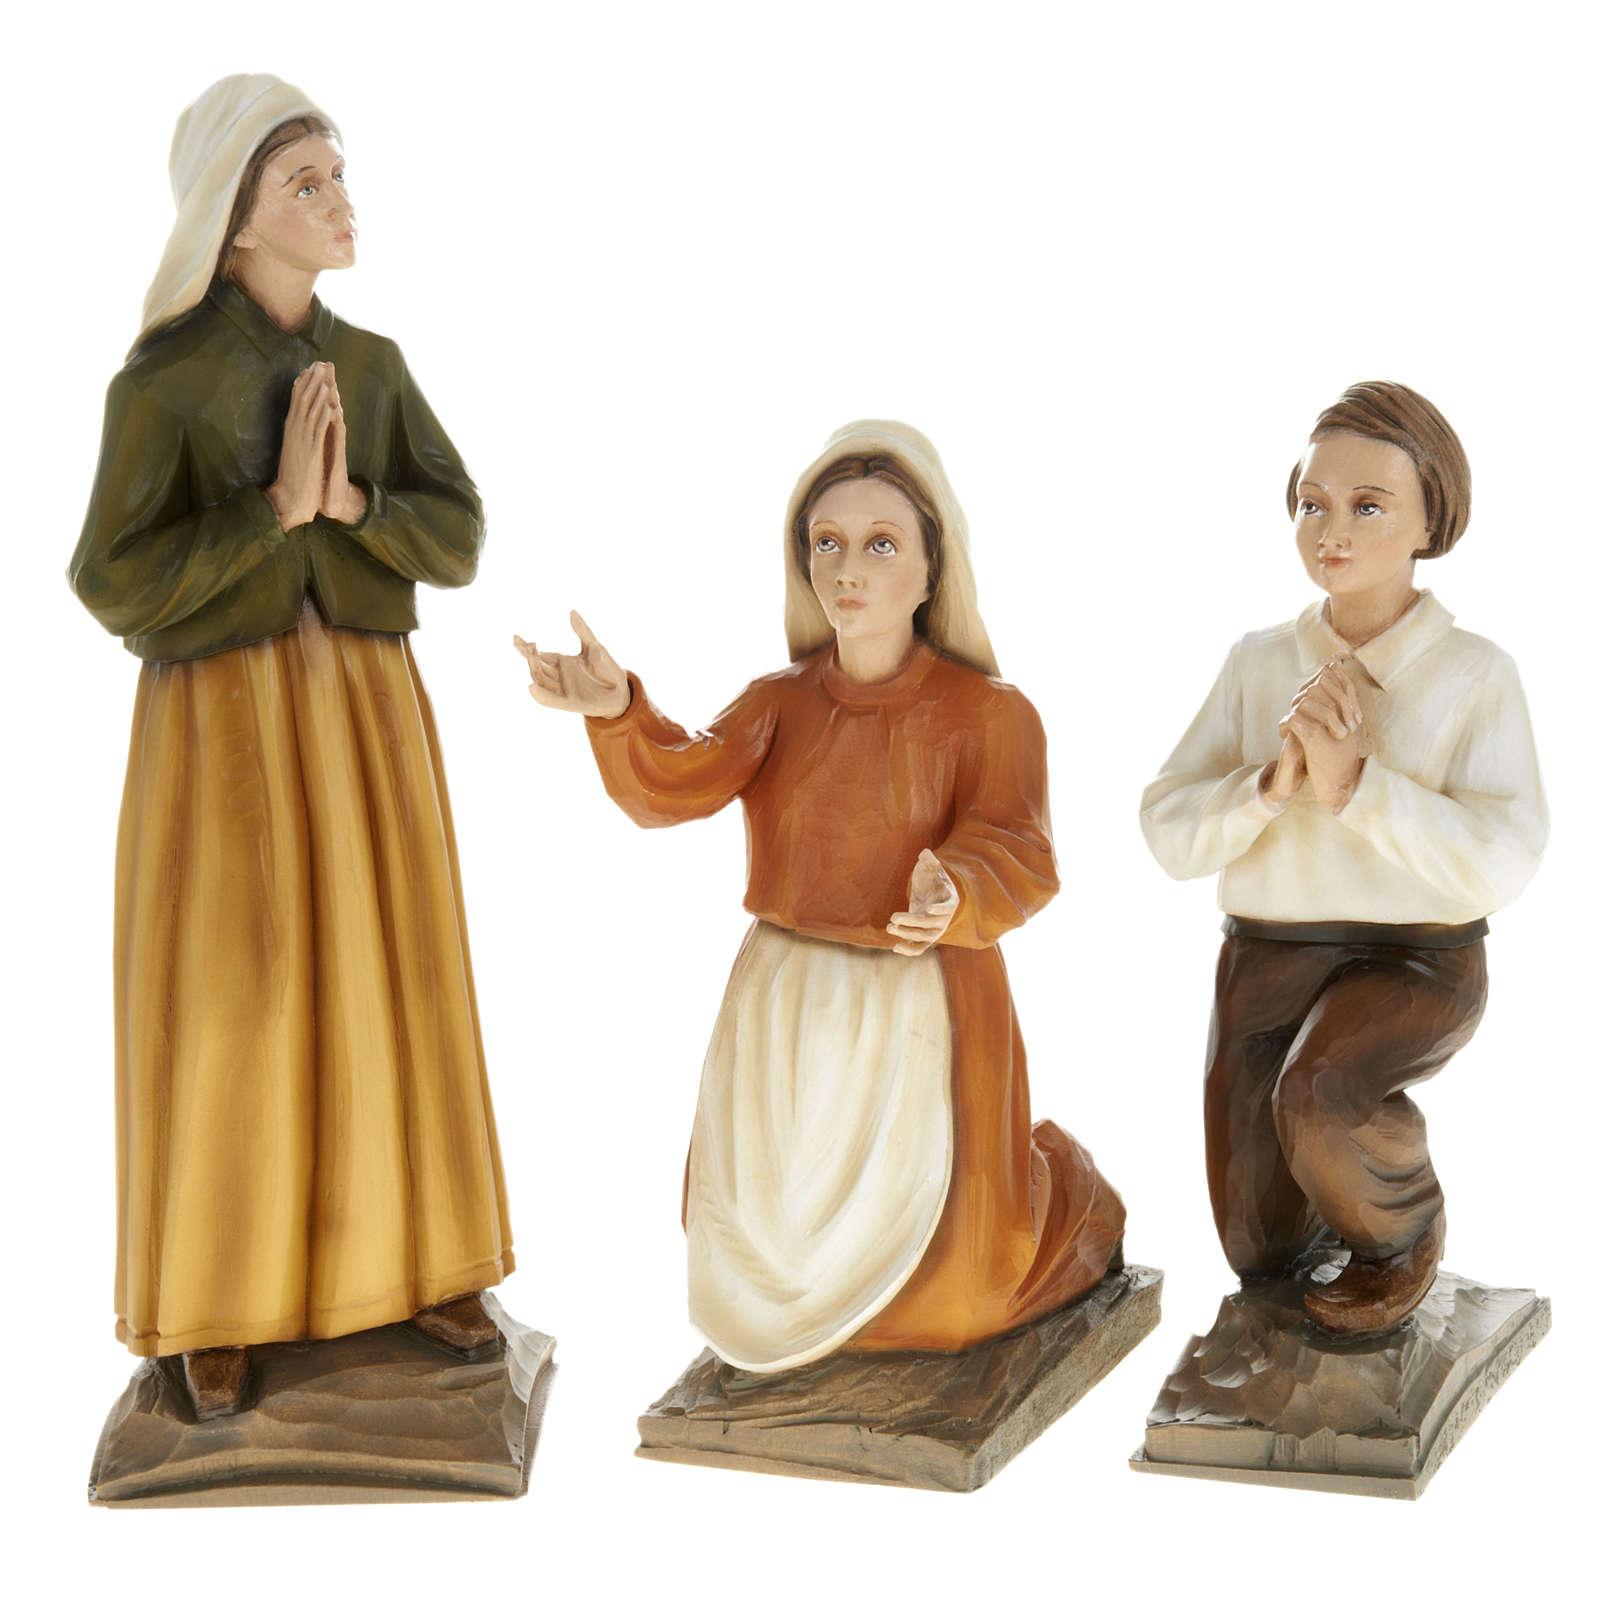 Shepherd children of Fatimain composite marble statues 14 inc 4